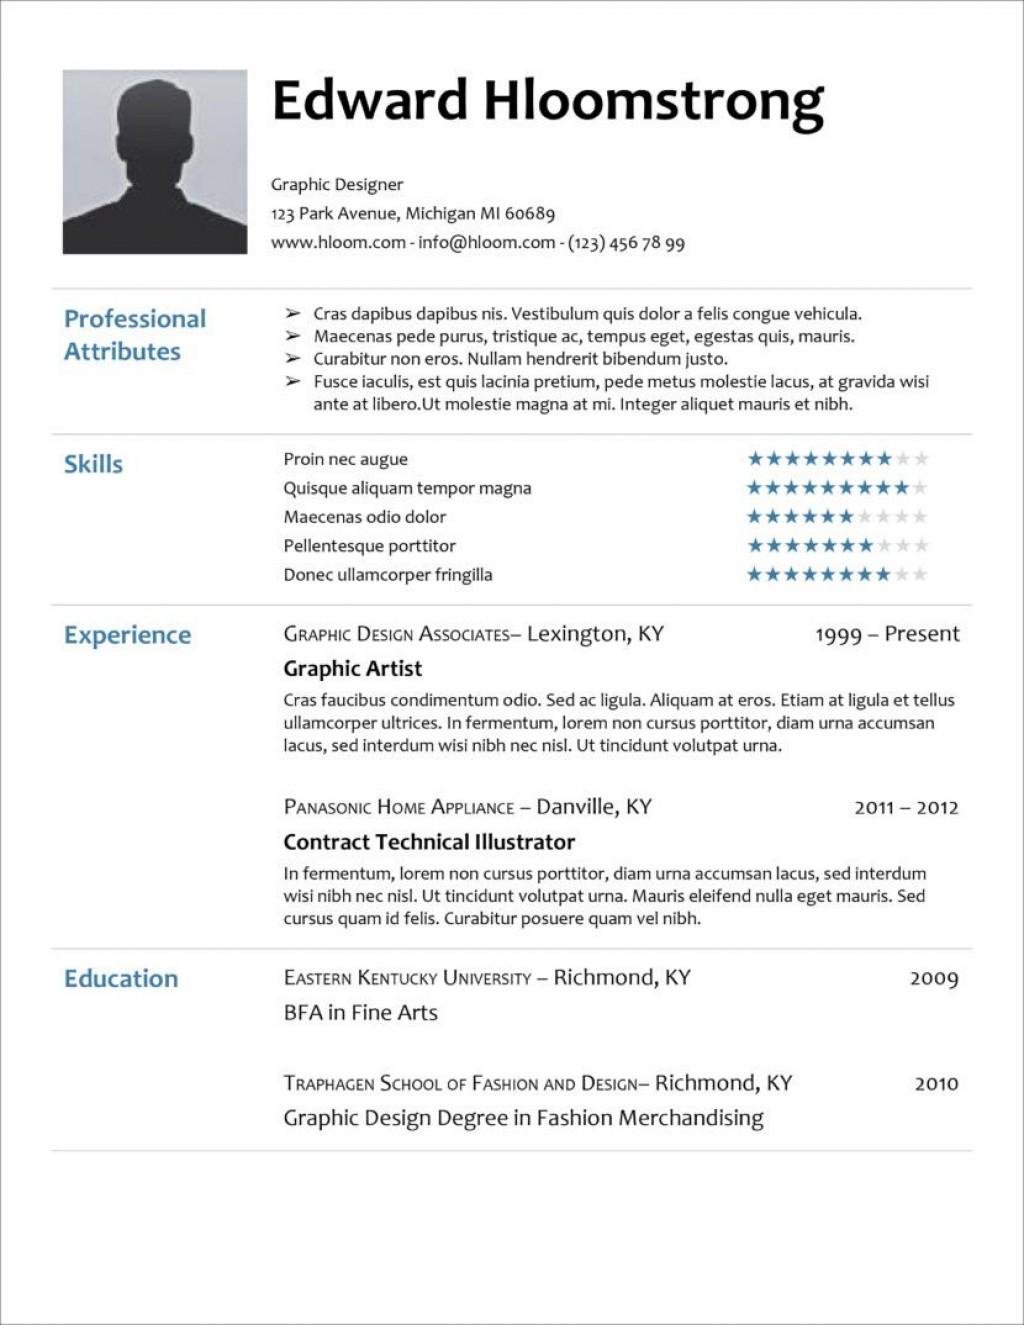 007 Impressive M Word 2010 Resume Template High Def  Templates Office Free Microsoft DownloadLarge